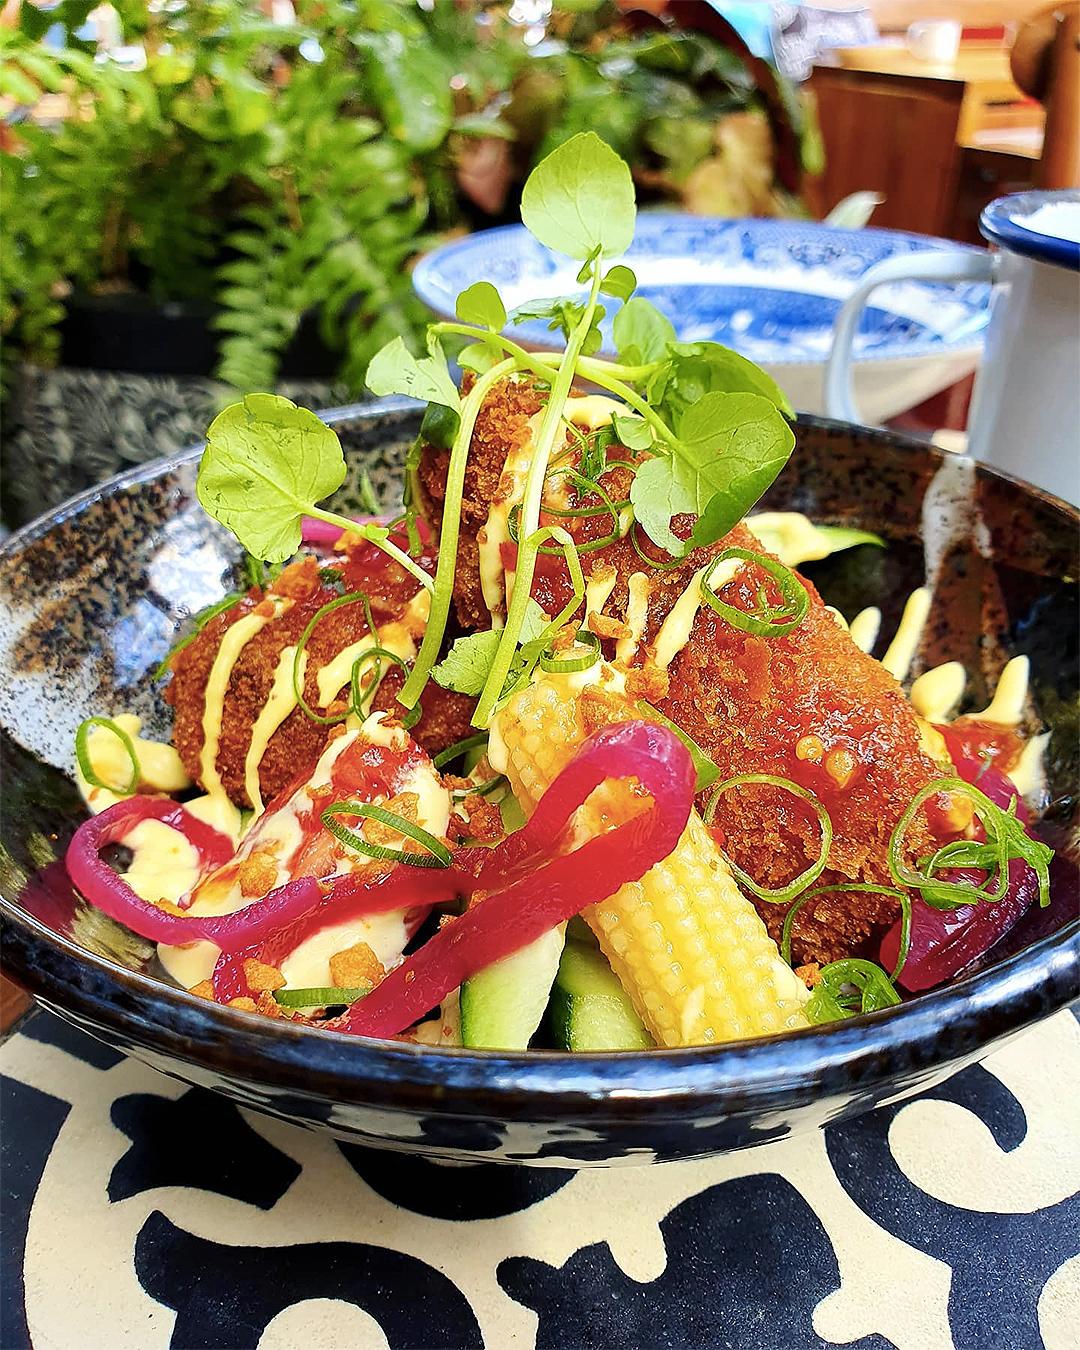 Vegan Tempeh Croquettes.  Pickled Baby Corn, Shallots, Sweet Chilli Relish Vegan Mayonaisse, Cucumber at Tok Tok.